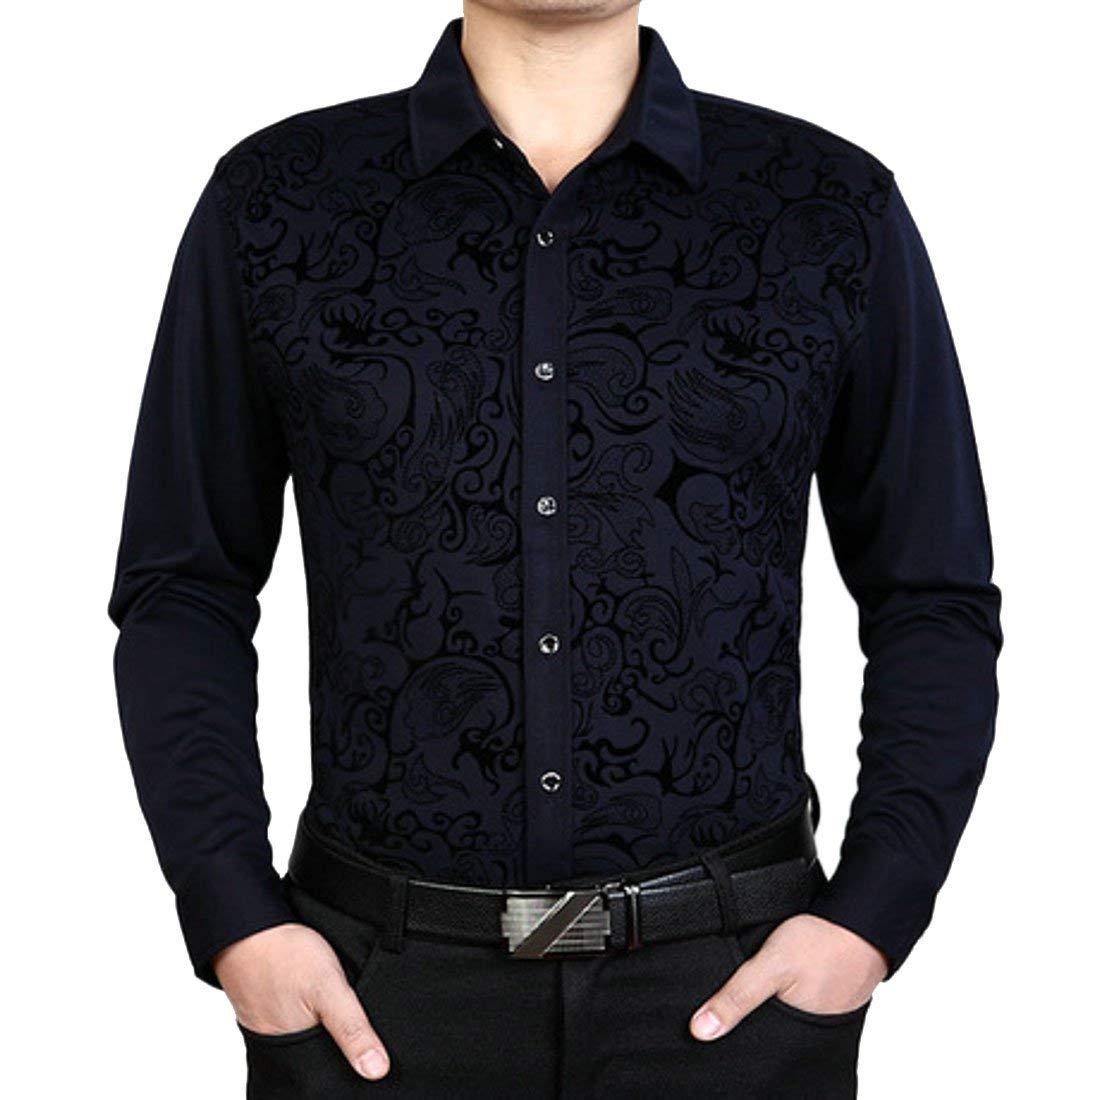 SELX Men Plus Size Plus Size Autumn Thicken Long Sleeve Print Button Up Cotton Fleece Shirt